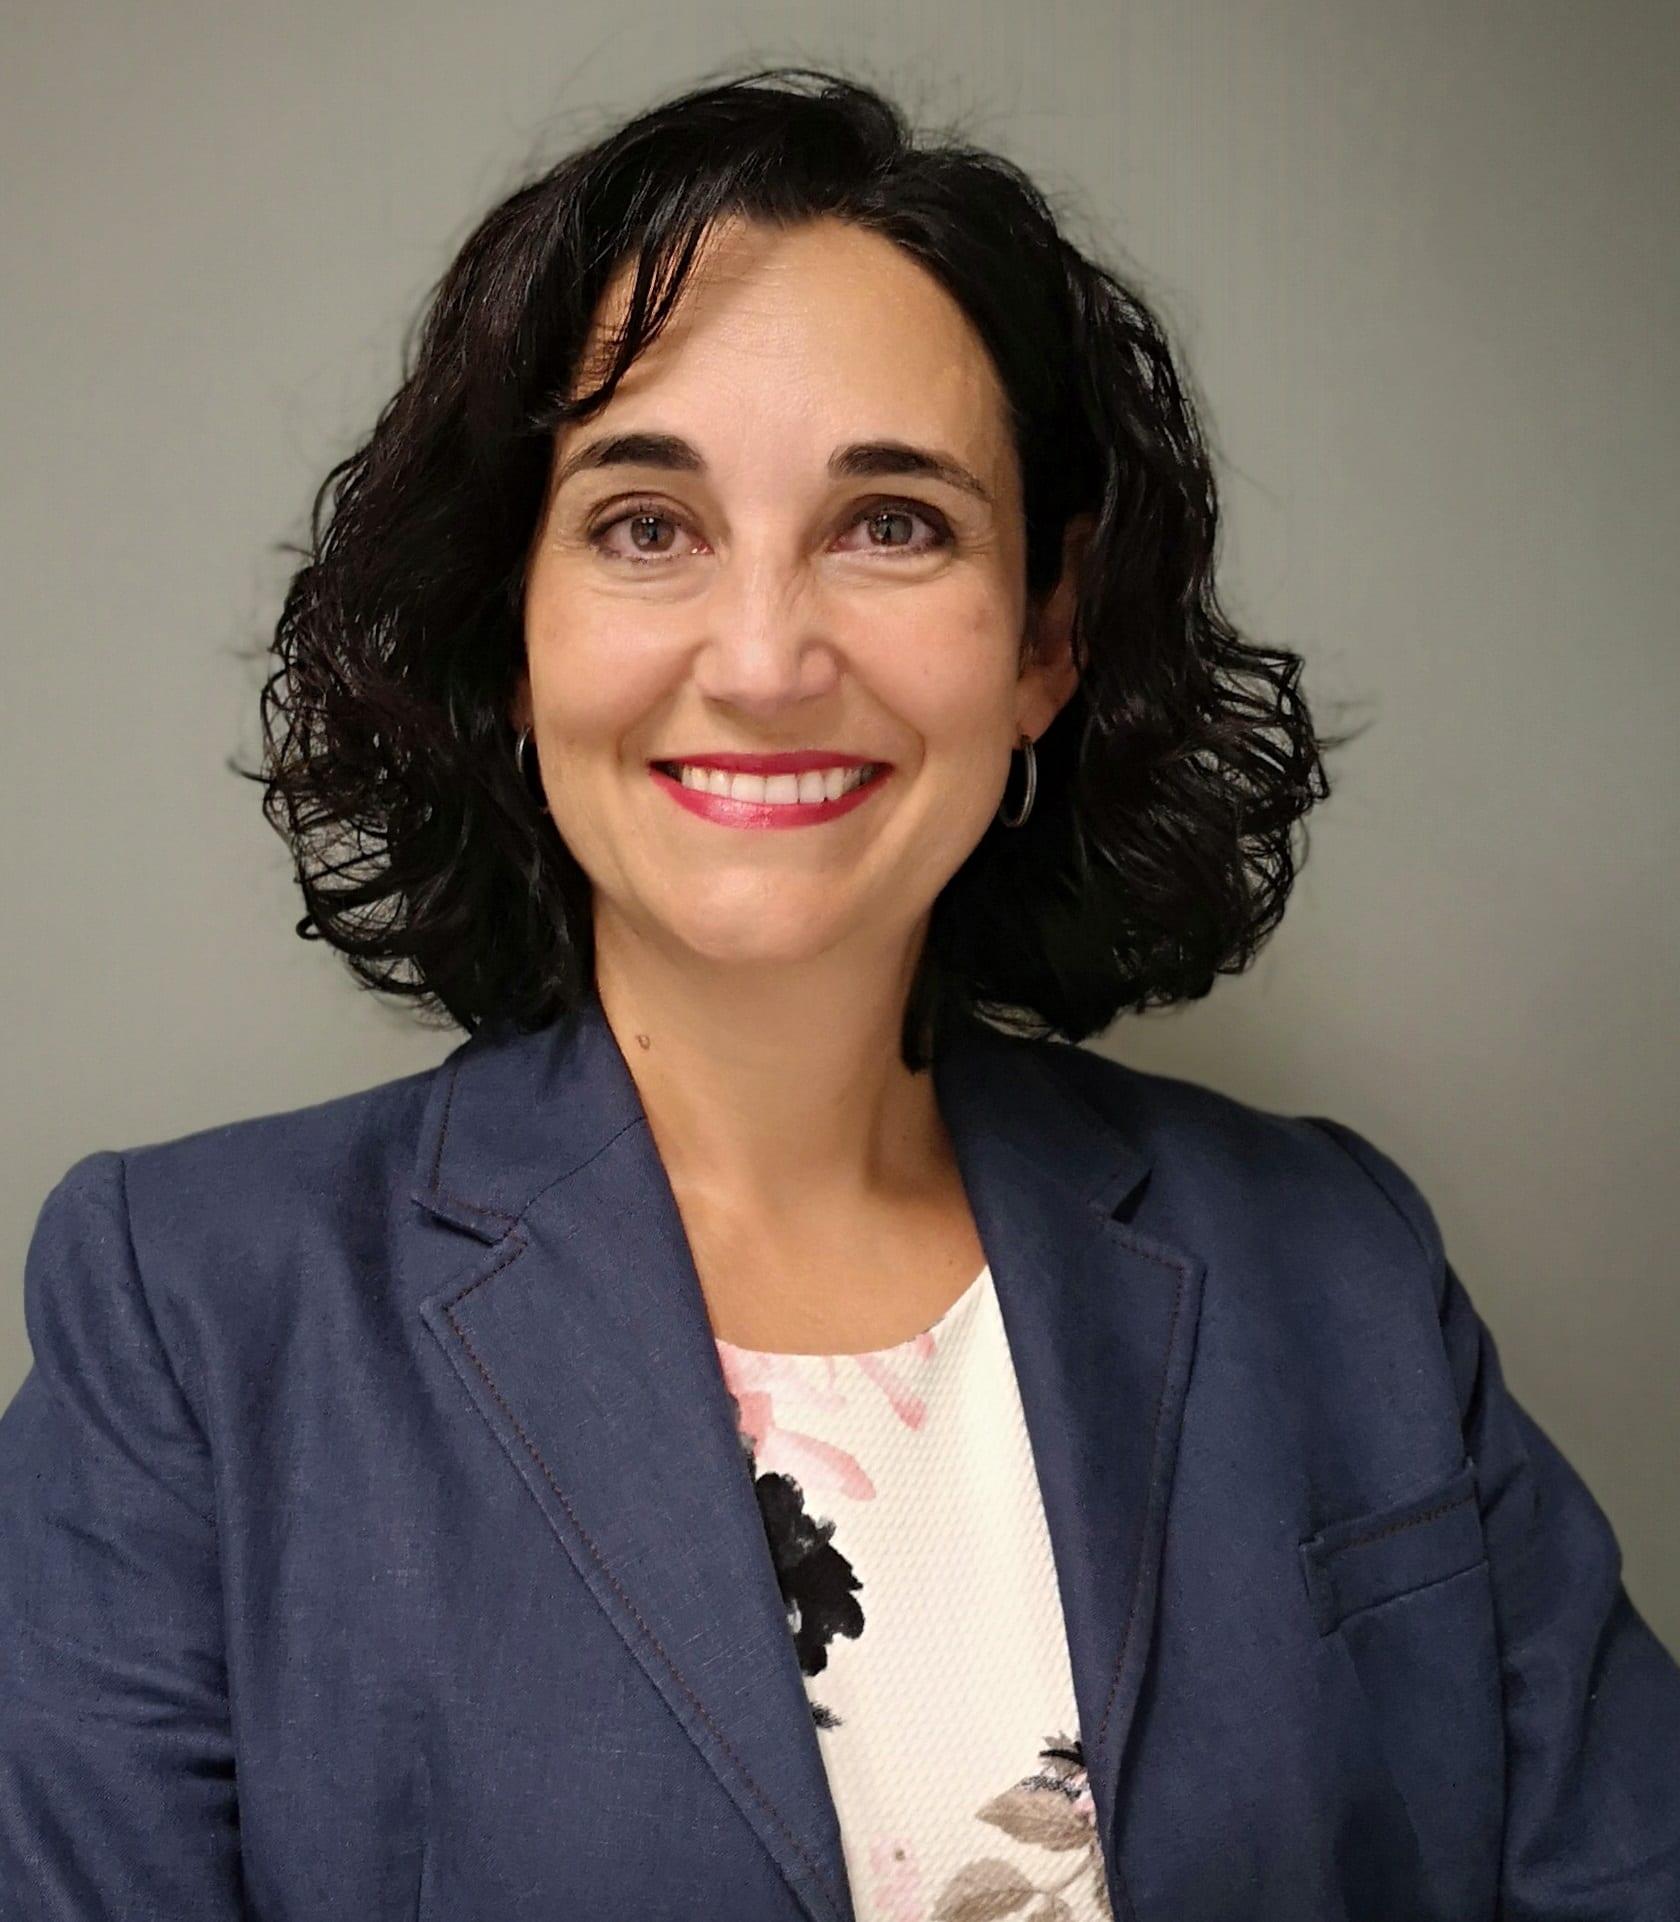 Susana Sierra